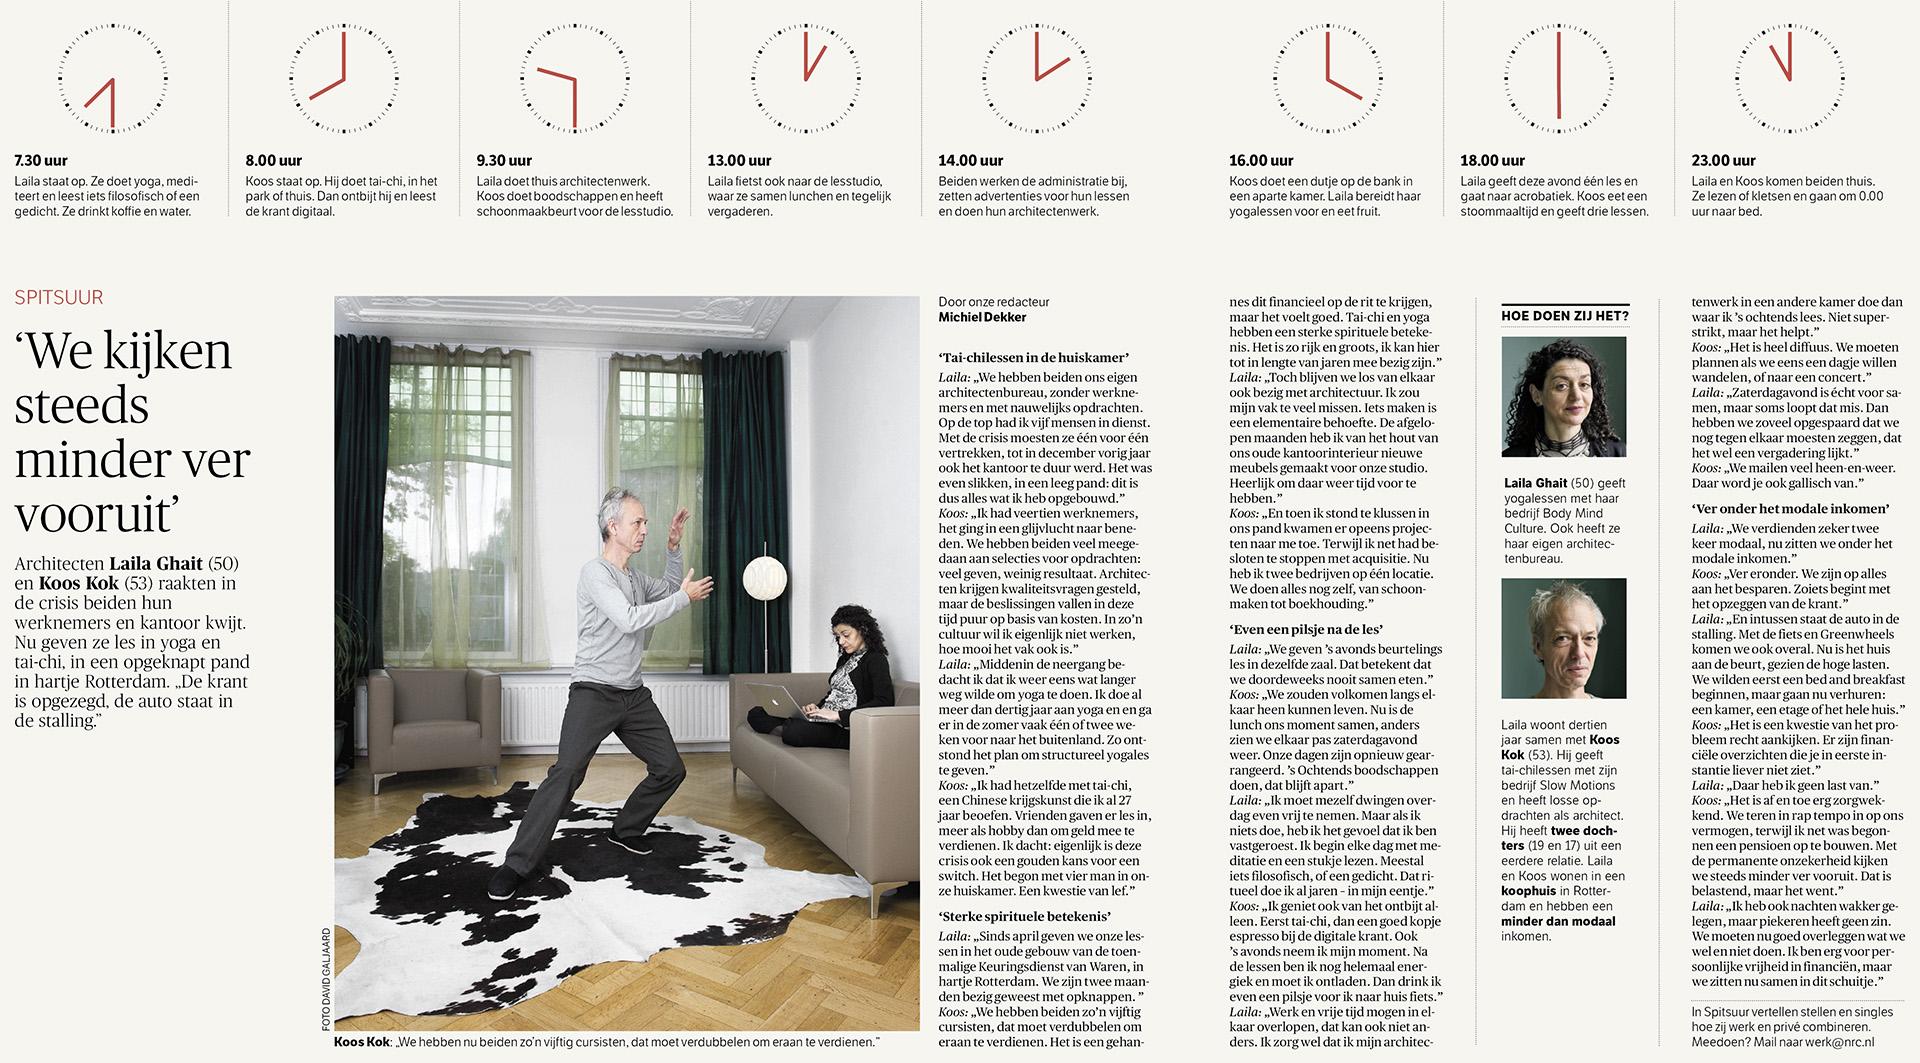 NRC Handelsblad - Economie - Spitsuur - 2013 - David Galjaard